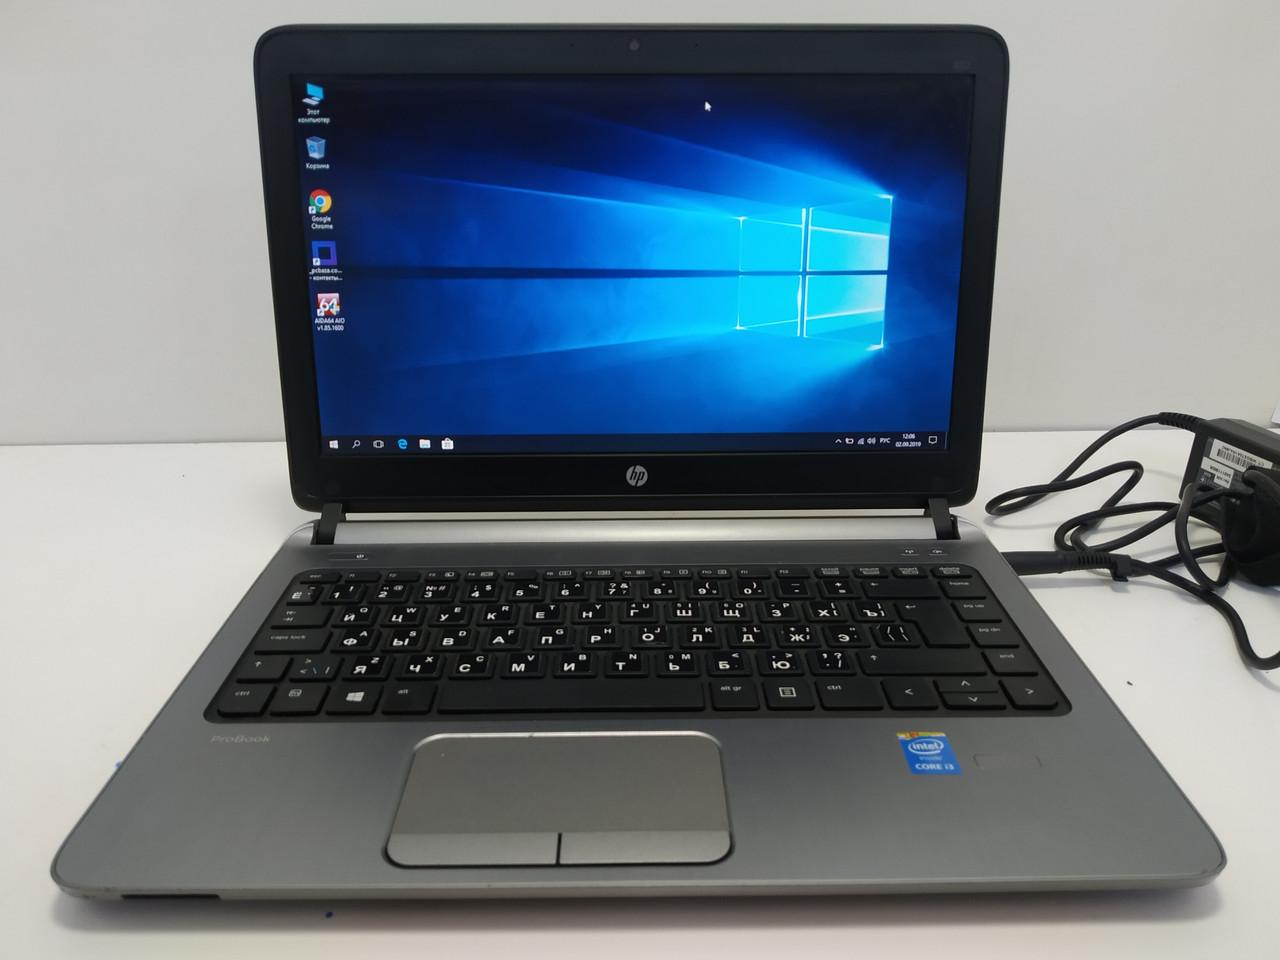 Ультрабук ProBook 430 G2 Intel Core I3 4030U 1.9, 4 Гб DDR3, SSD 256 GB MLC, Батарея до 6 часов